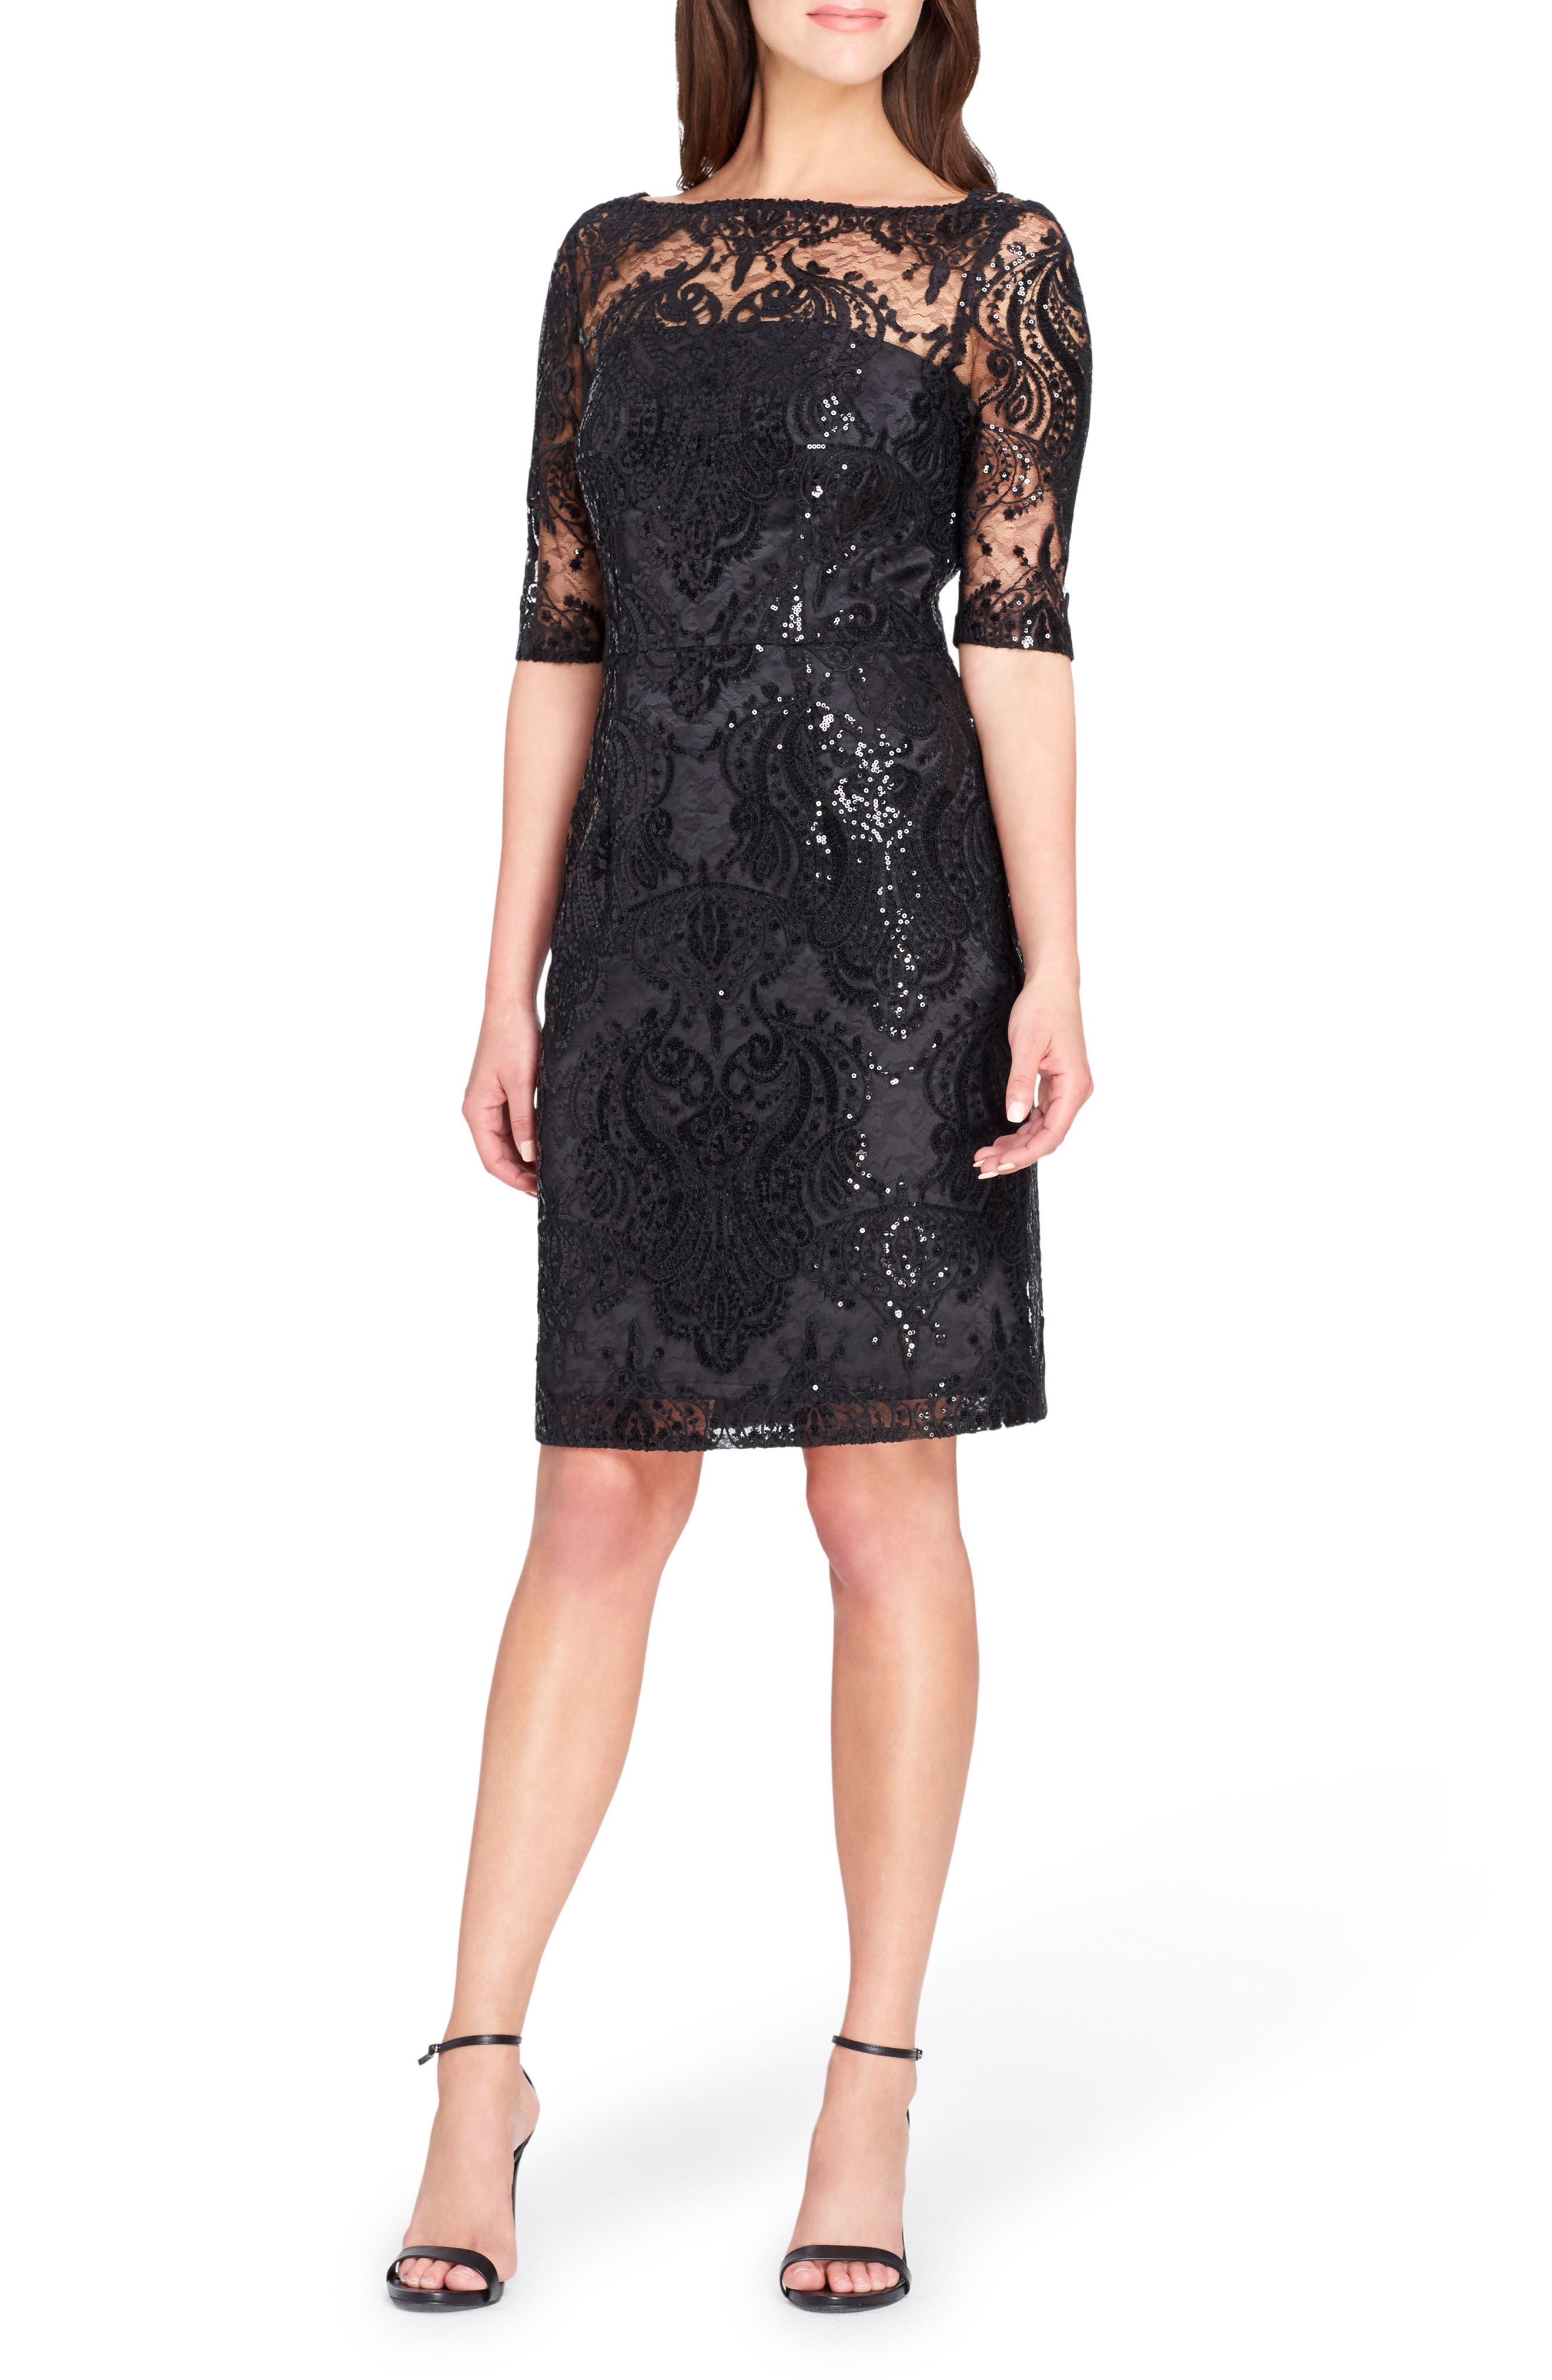 Alternate Image 1 Selected - Tahari Sequin Illusion Sheath Dress